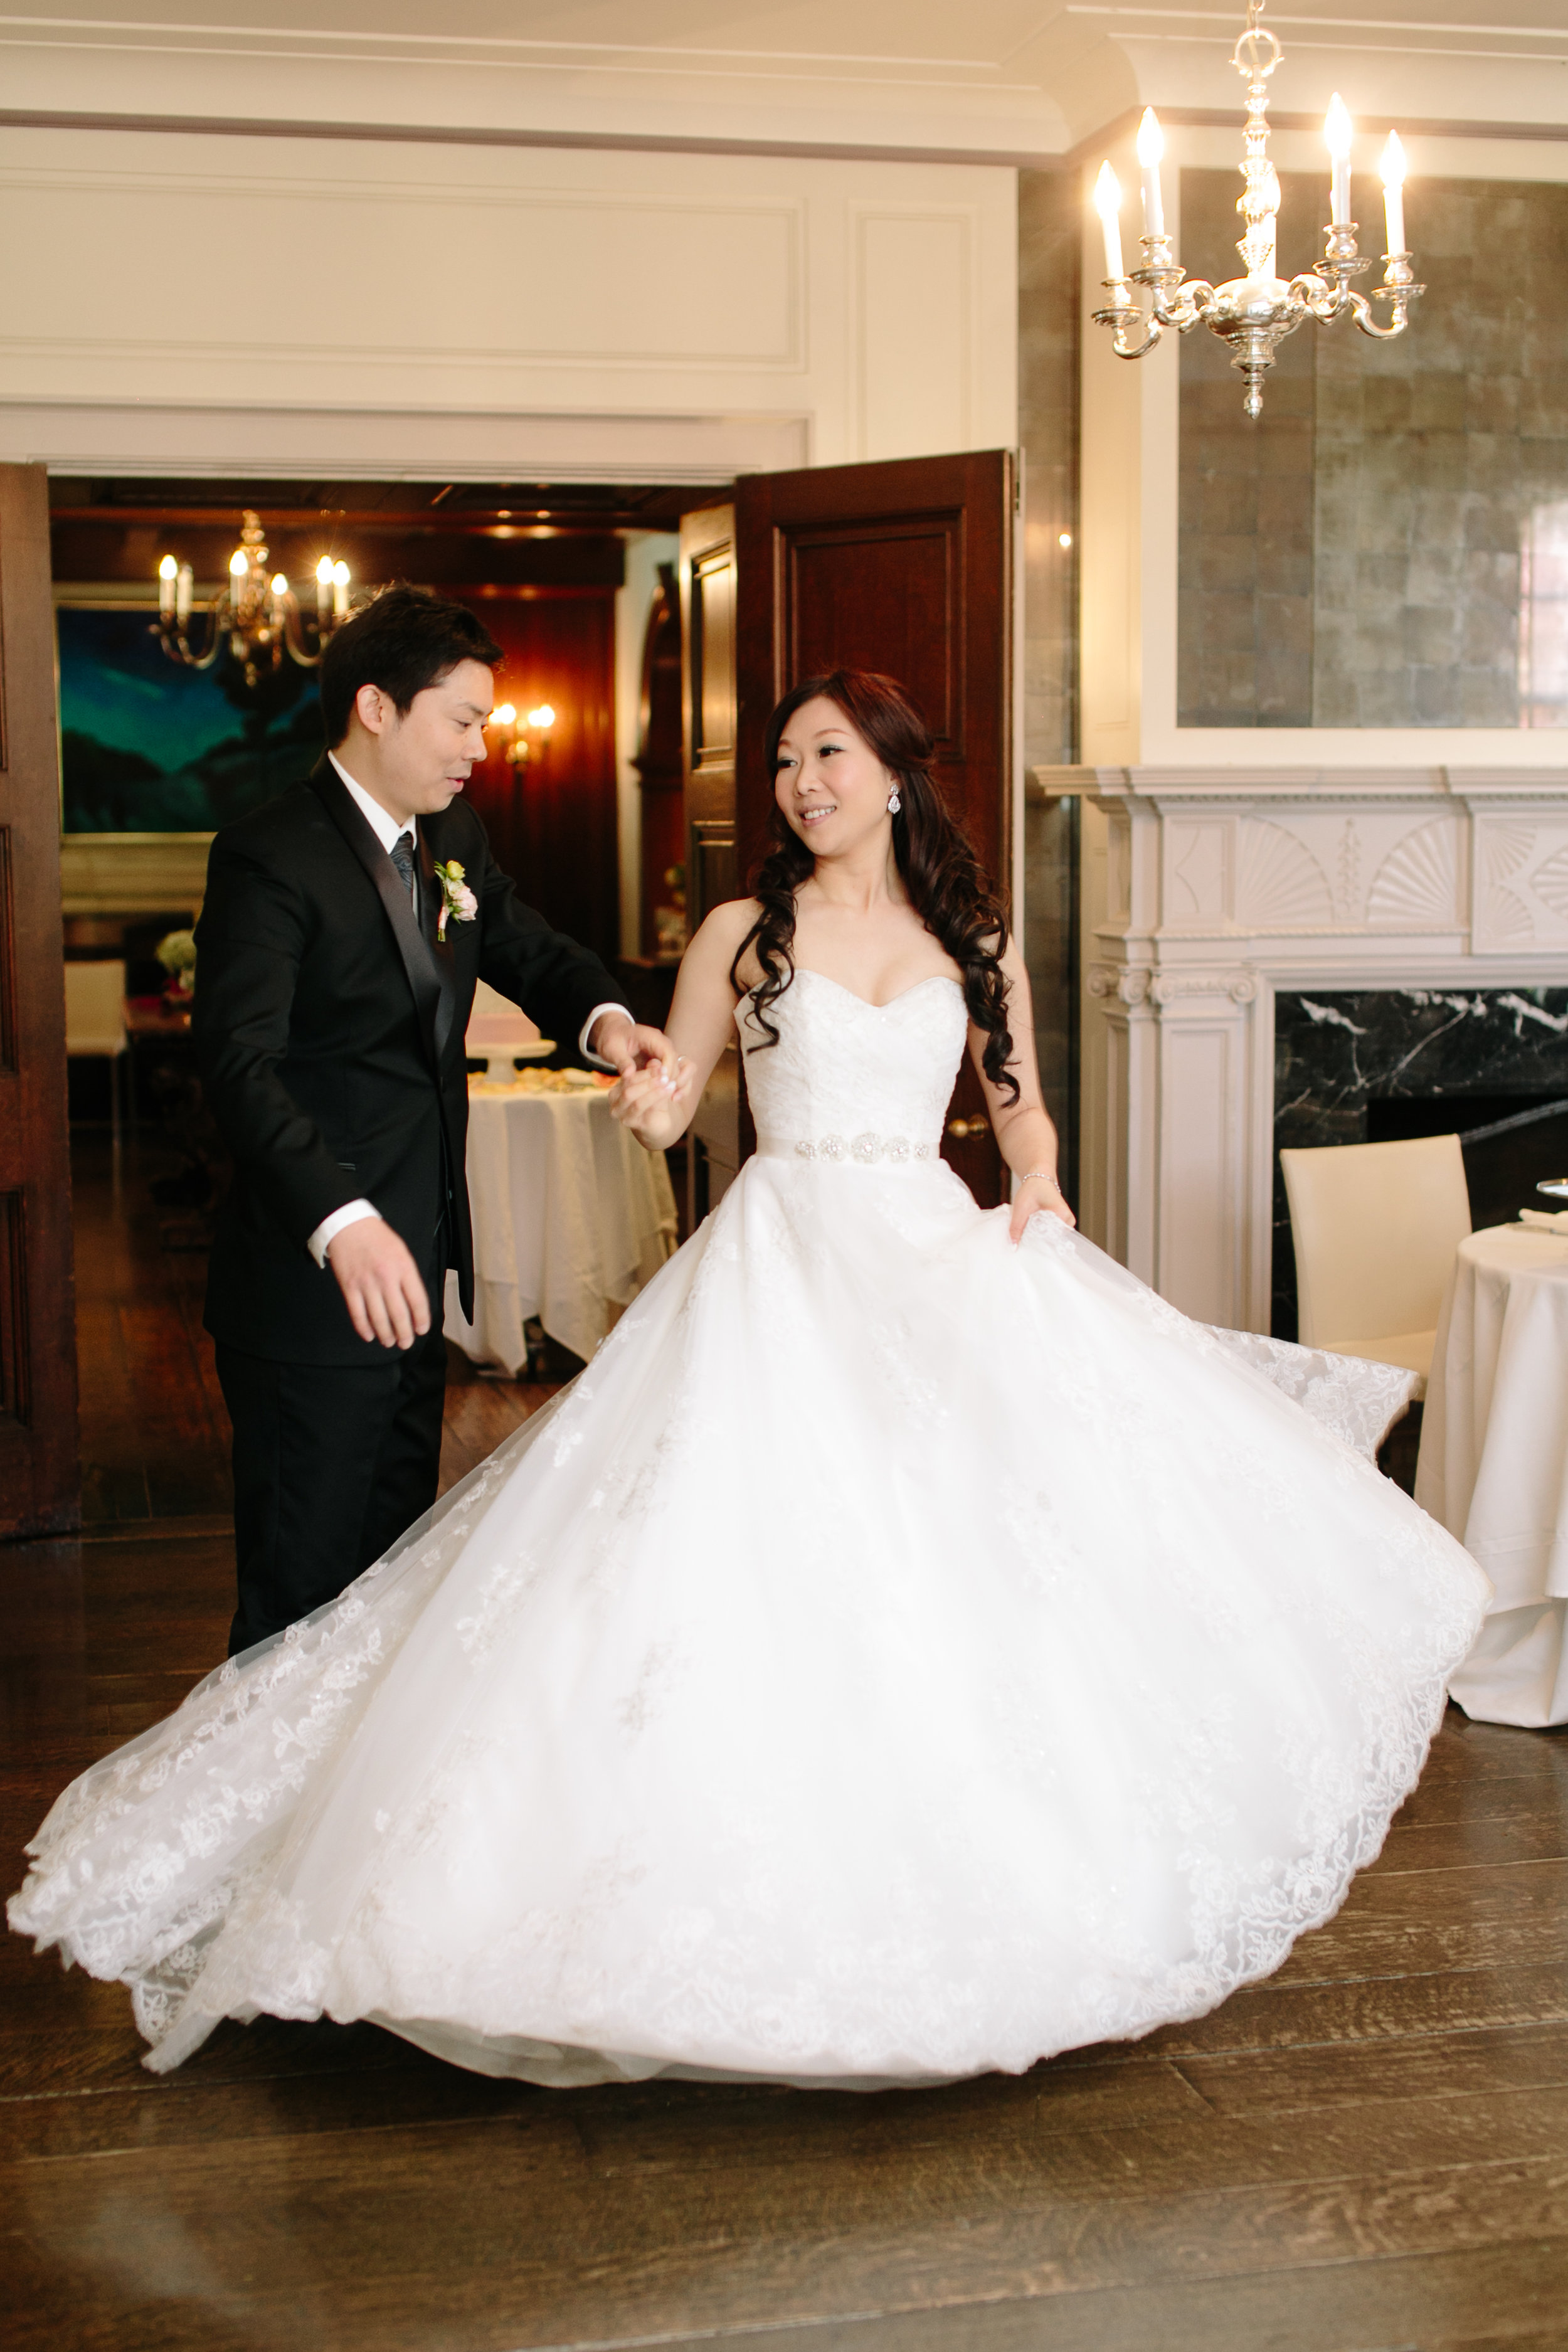 Phoebe Lo Events Toronto Wedding - Estates of Sunnybrook Rustic Event 034.jpg